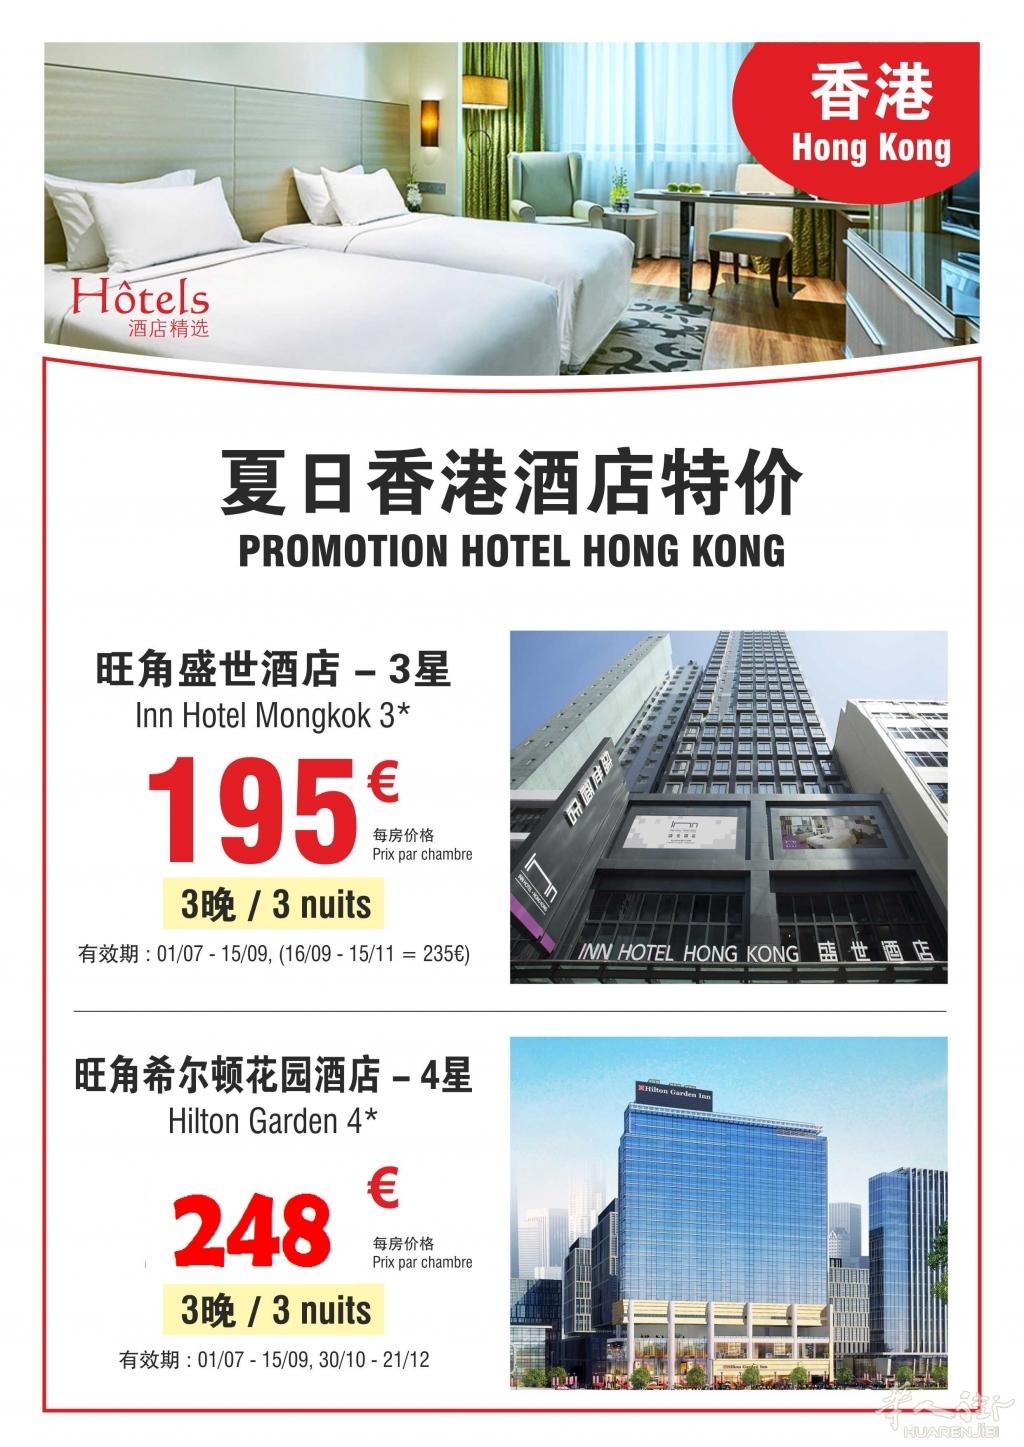 aff hotel-hong kong-v02 (2).jpg